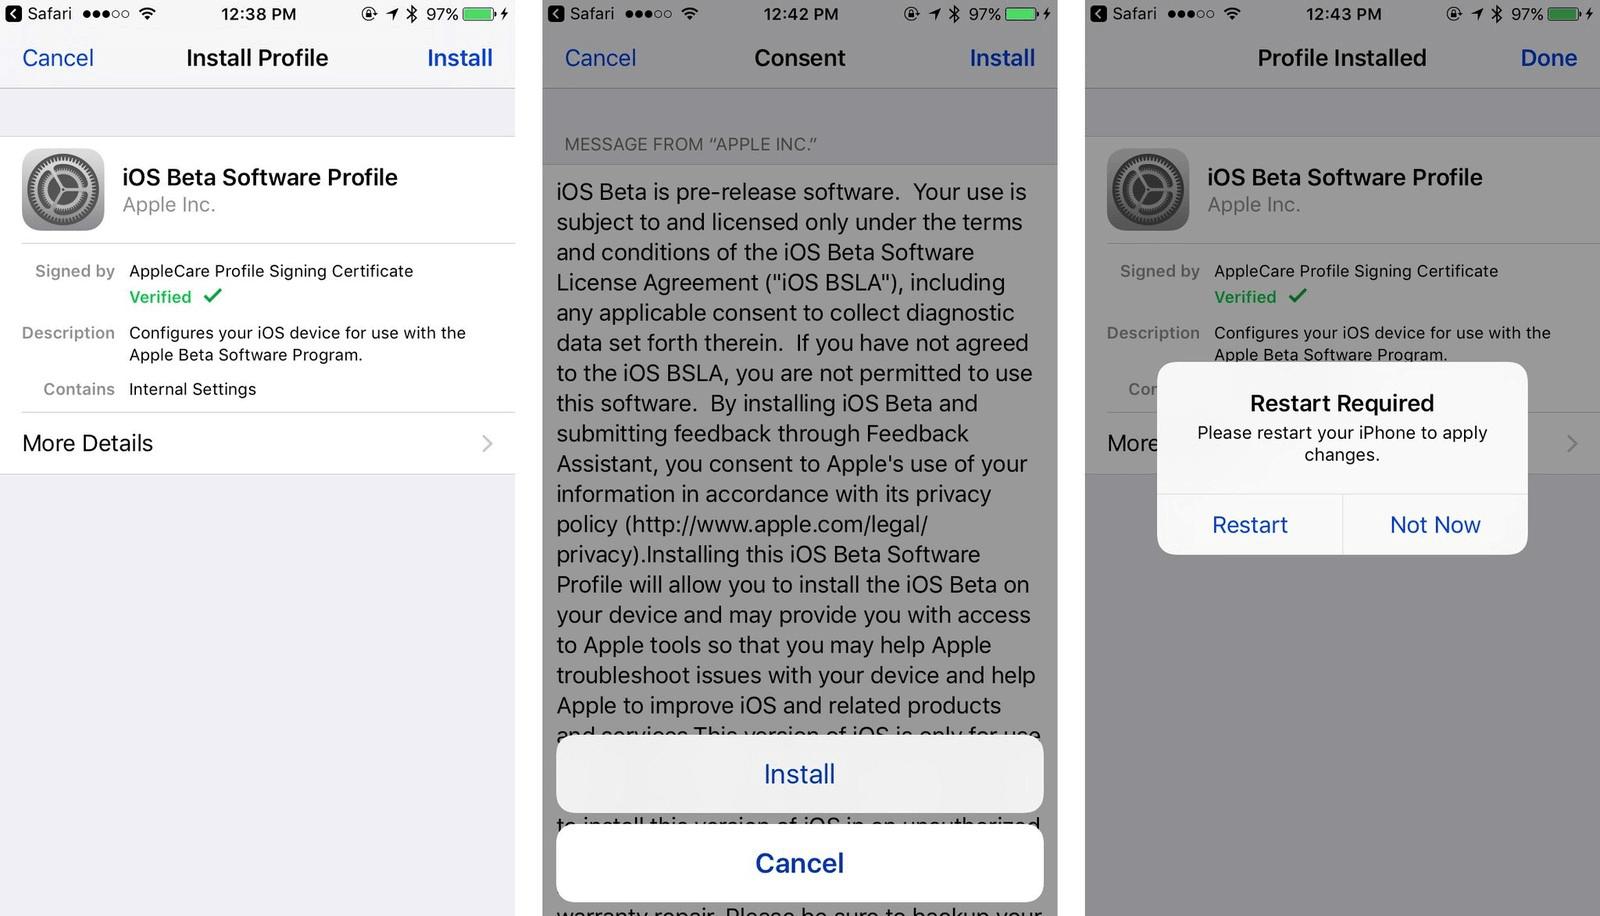 install ios beta profile and restart iphone